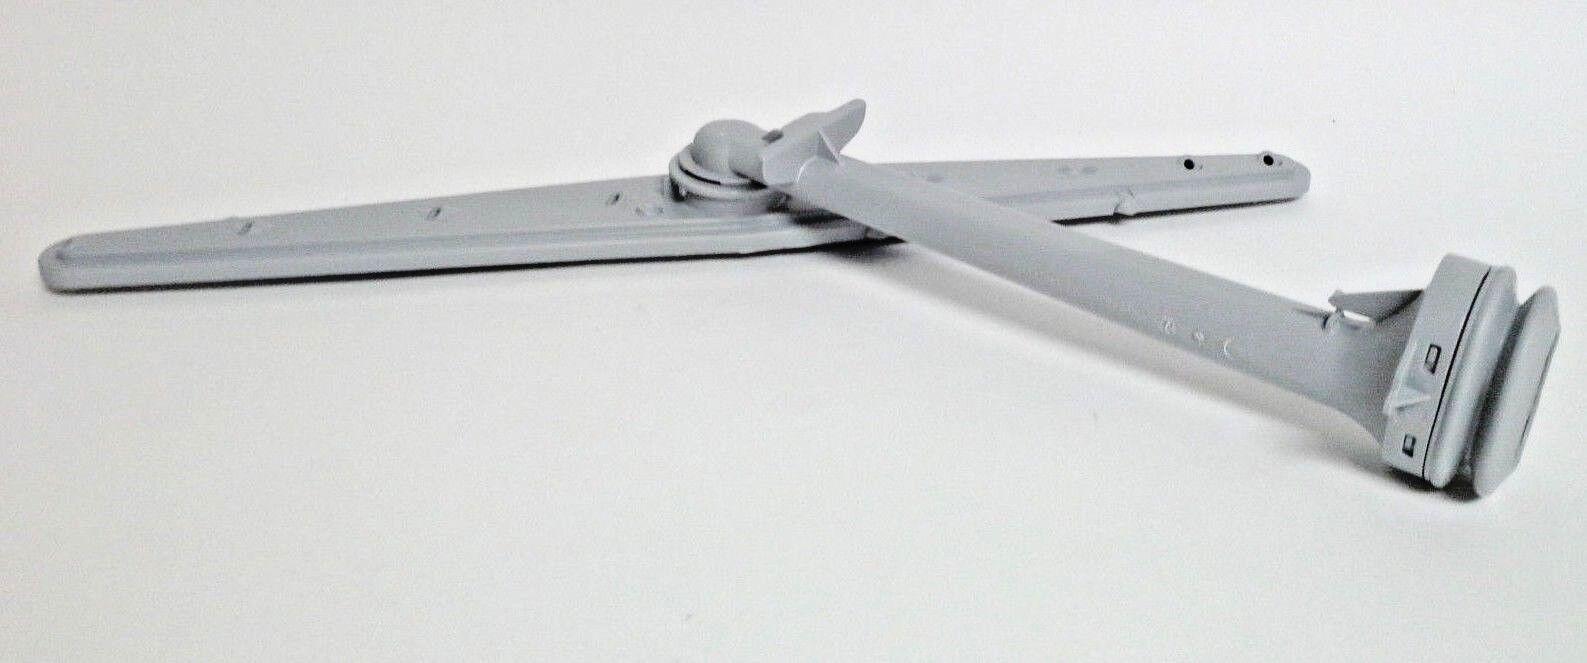 Frigidaire Dishwasher Top Upper Spray Arm Assembly 154468502